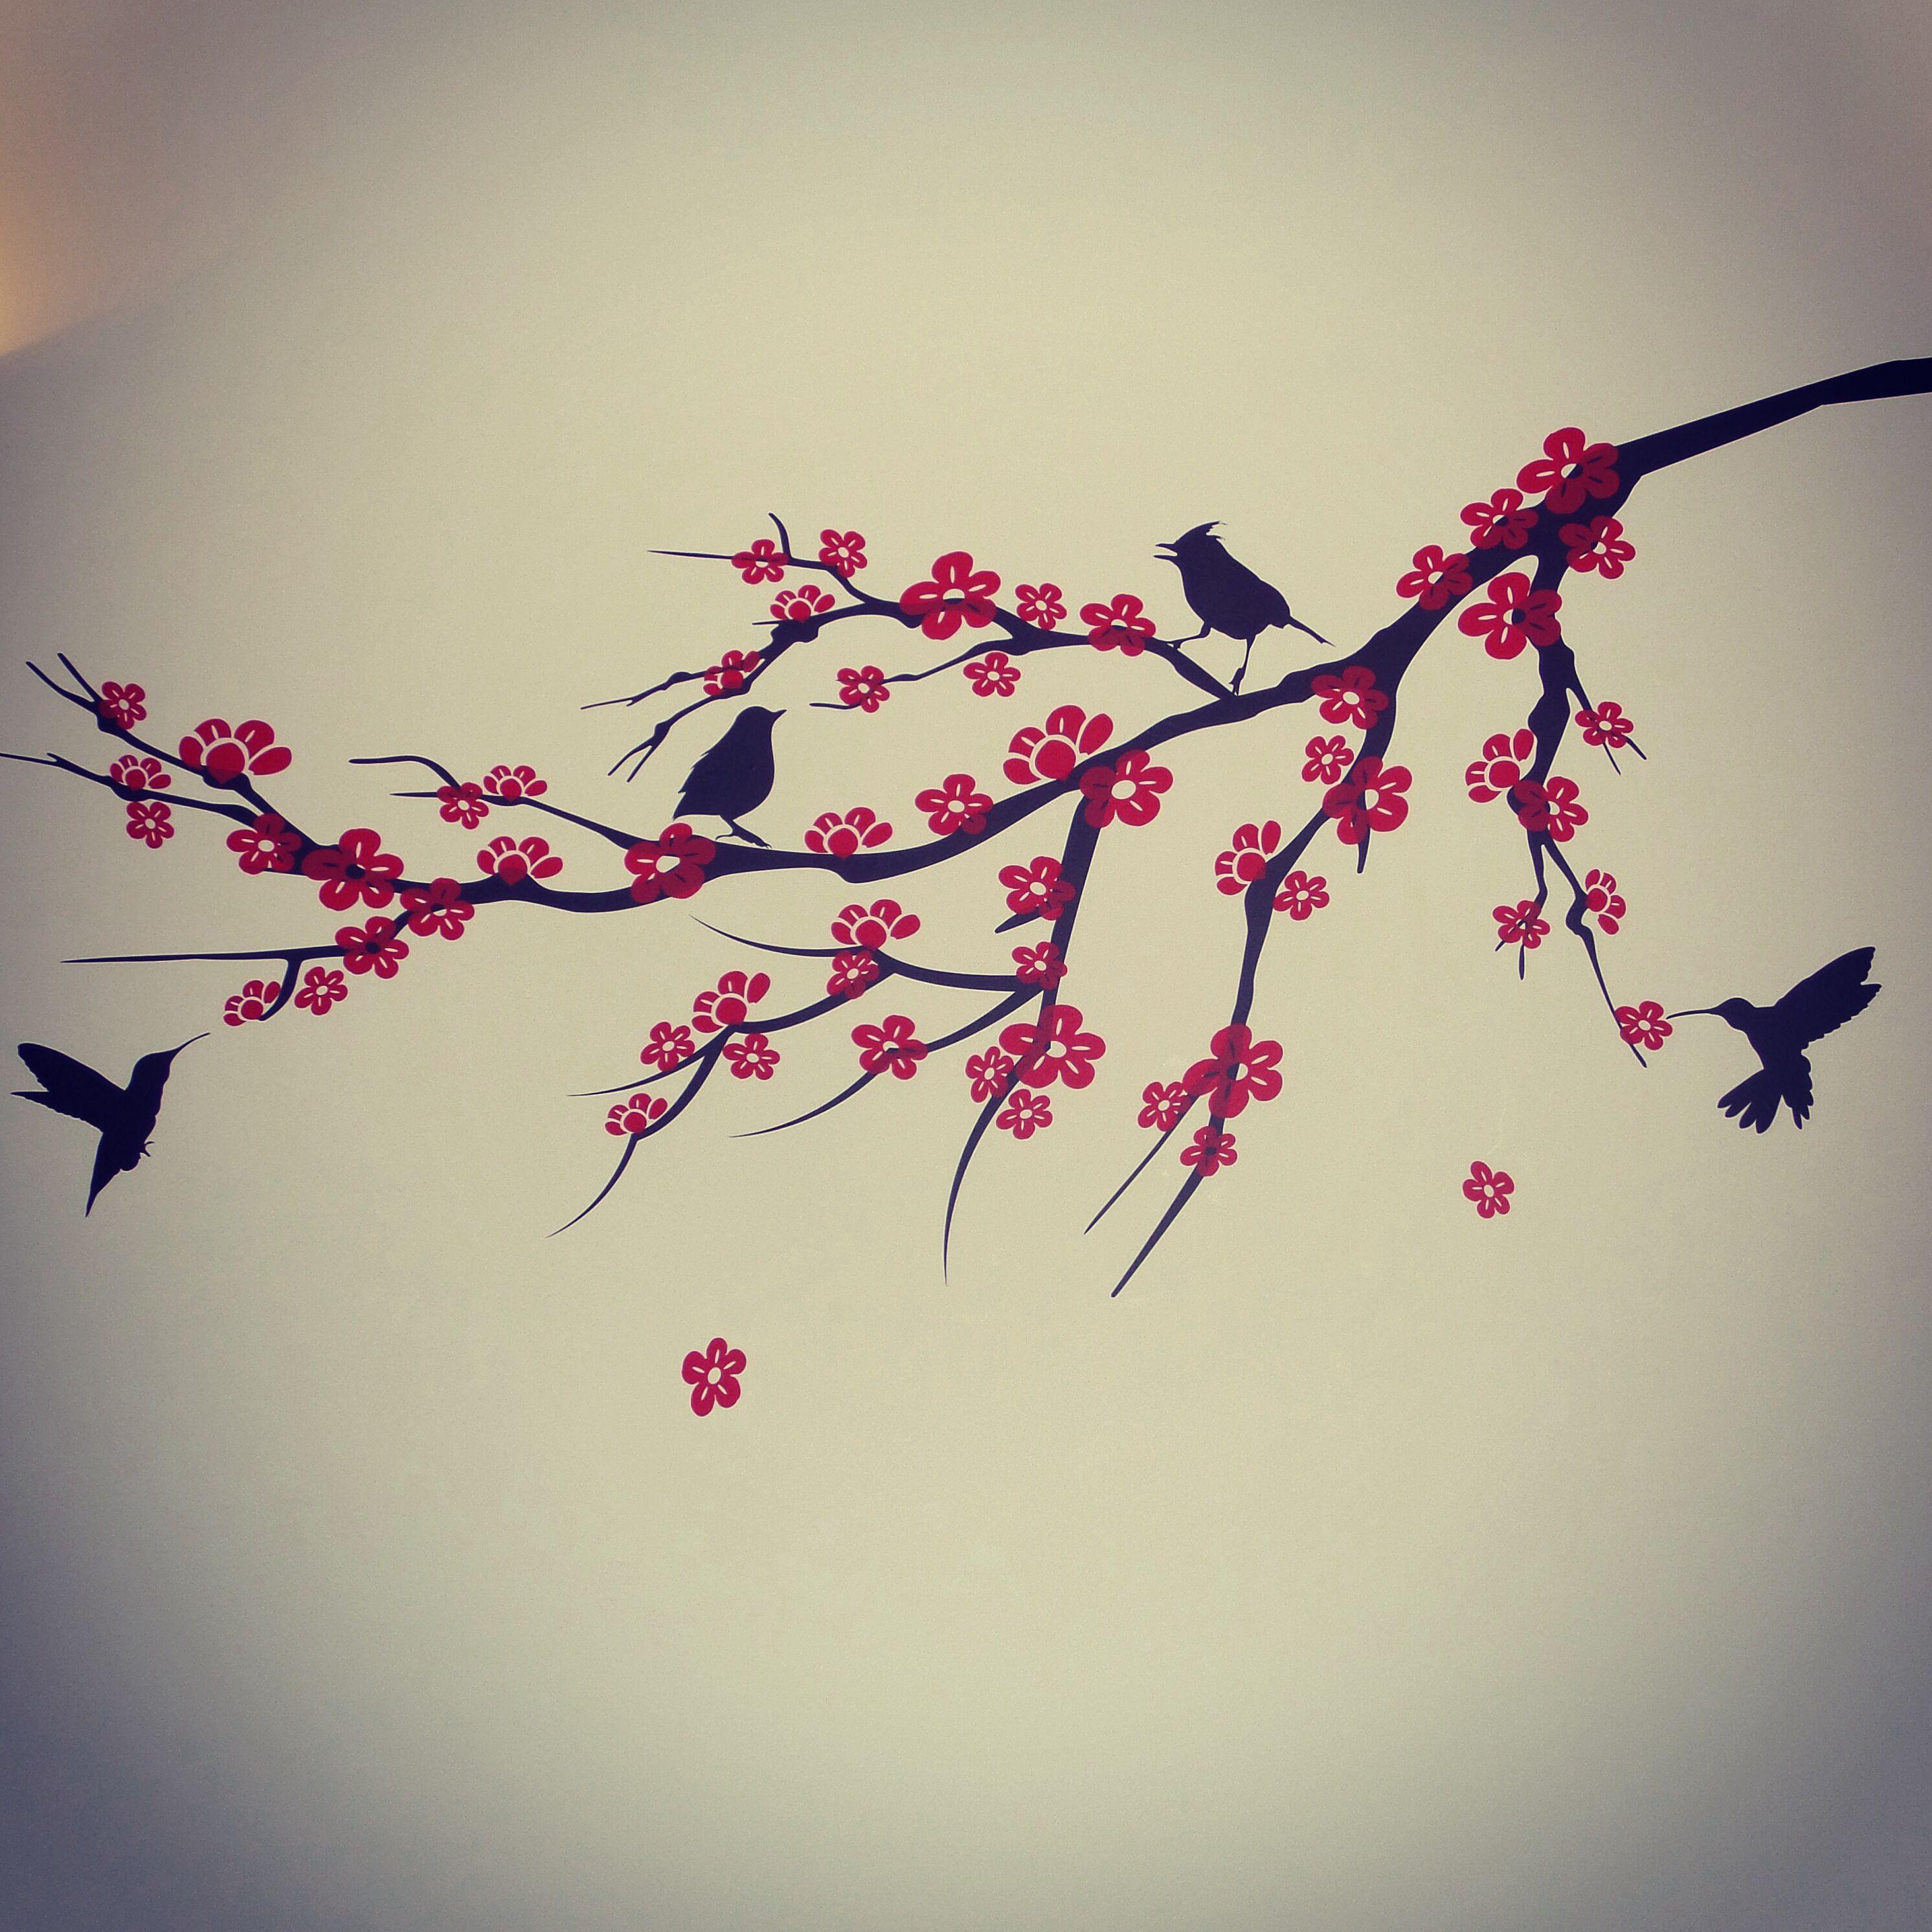 Sakura Cherry Blossom Black Red Bird Tree Branch Wall Decal Tree Tattoo Small Cherry Blossom Tree Tattoo Blossom Tree Tattoo